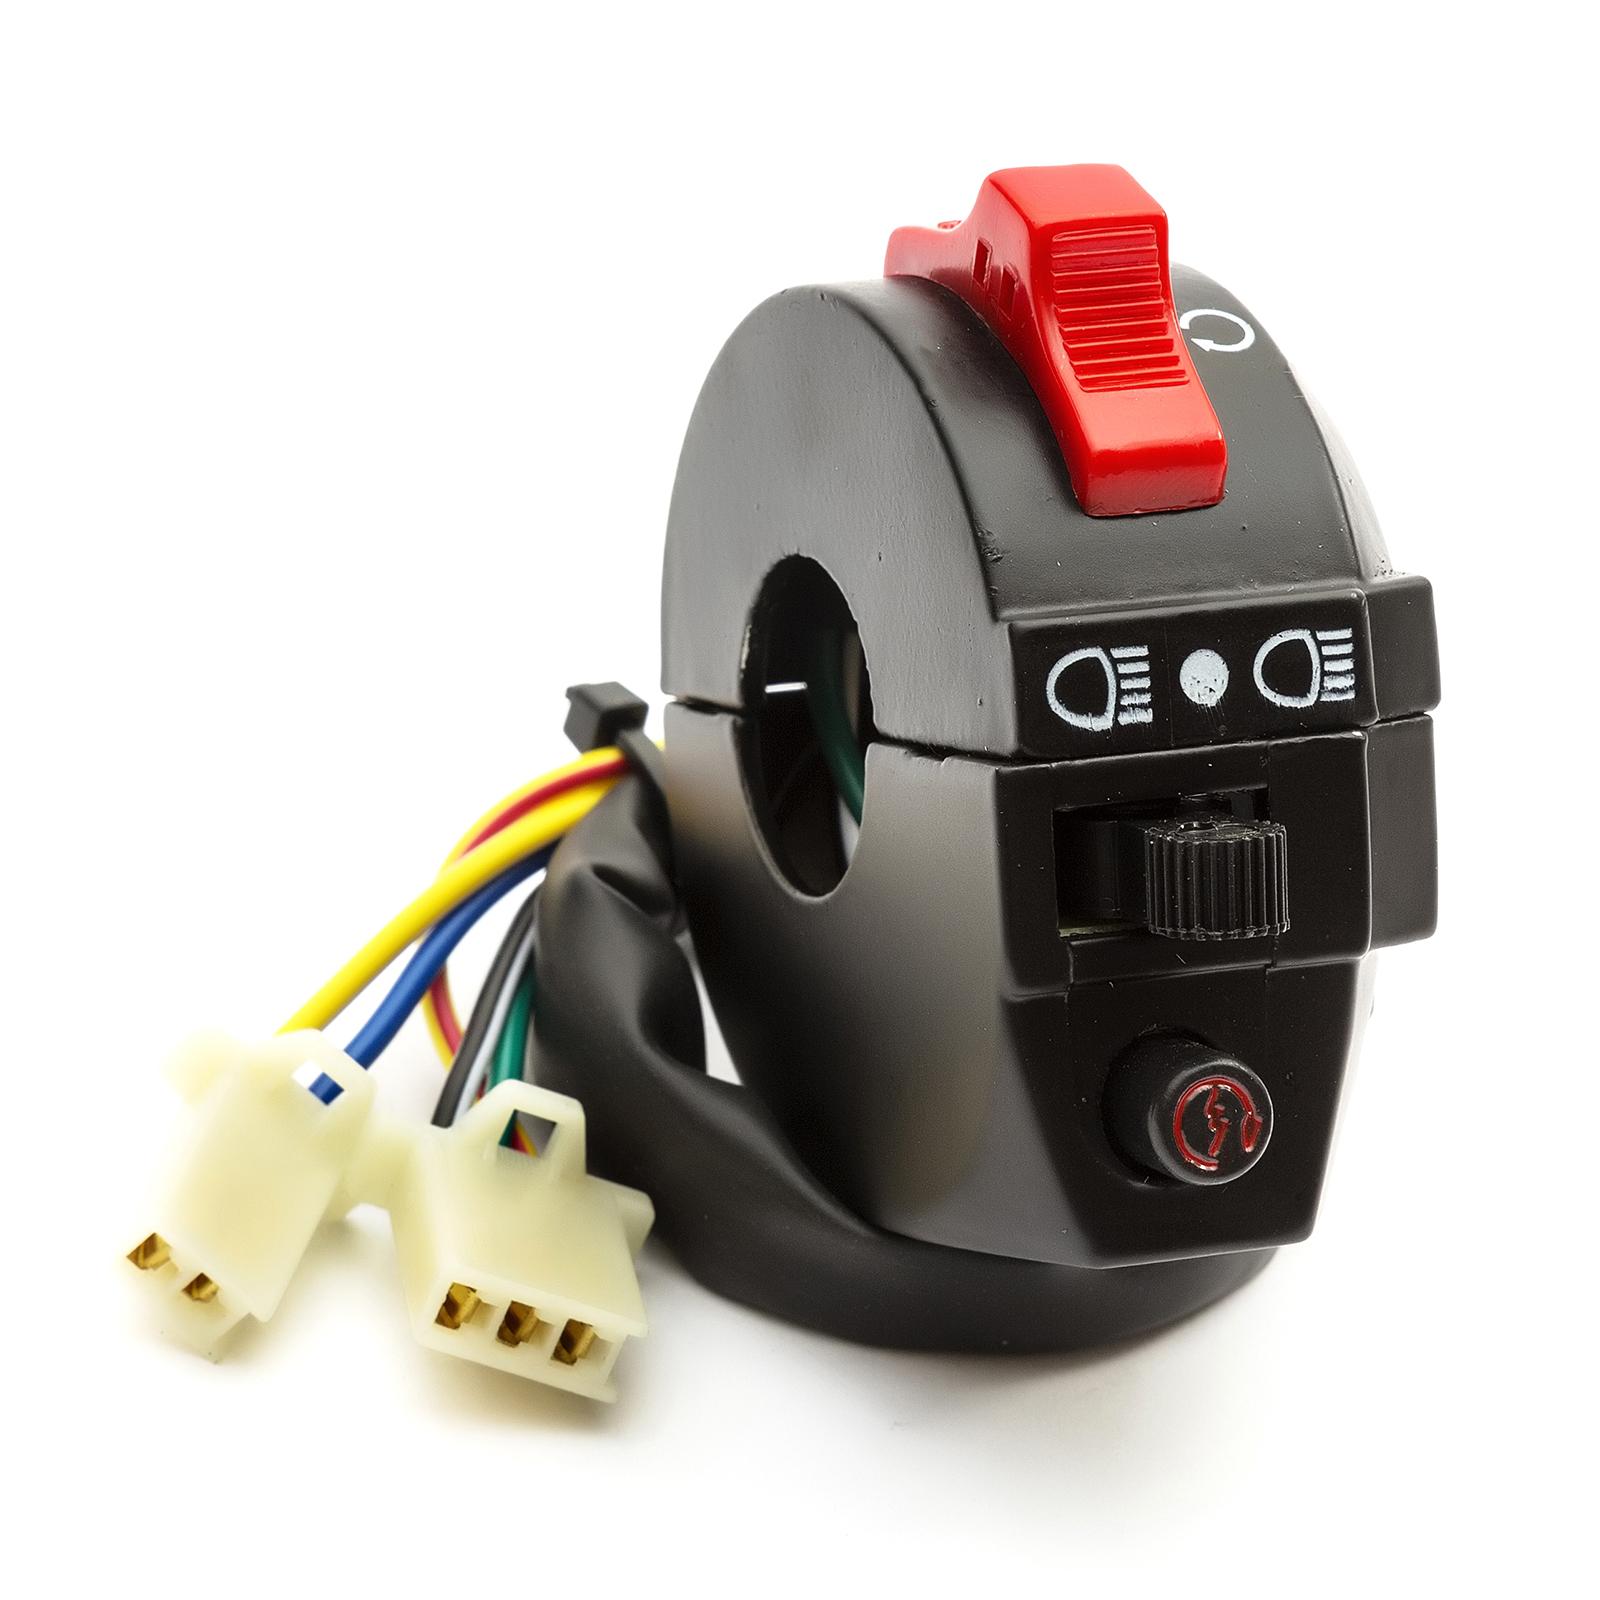 Kazuma Meerkat 50cc Atv Quad Handlebar Switch Fits Redcat Shark Genuine Parts 5055583002311